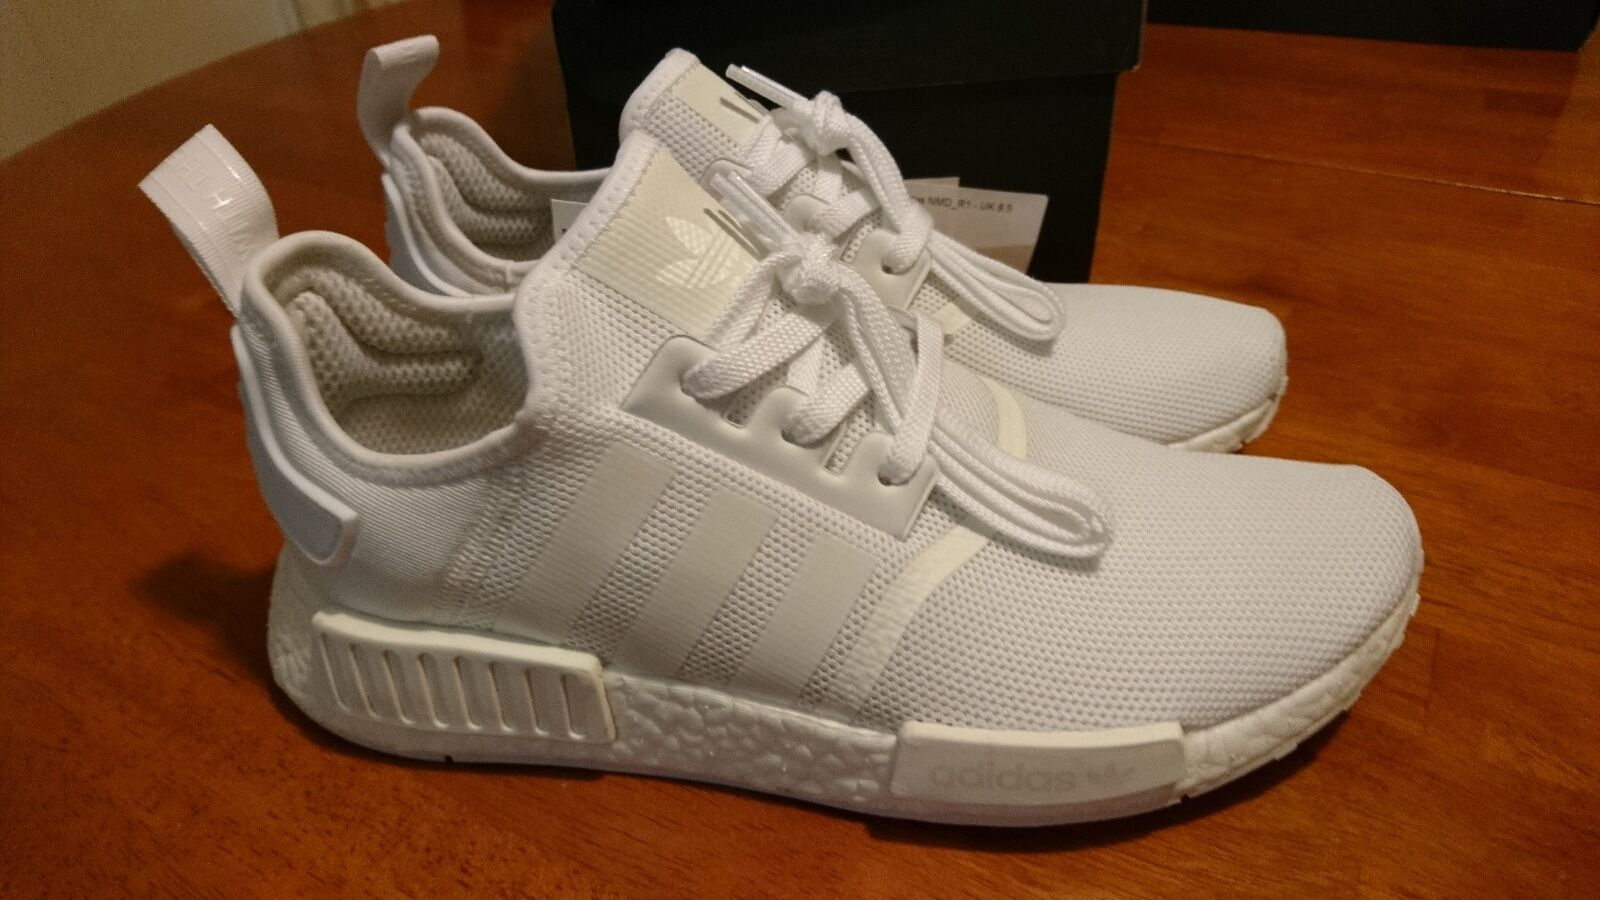 adidas Originals NMD R1 Boost Triple White Mens BA7245 US 9.5 Cheap women's shoes women's shoes